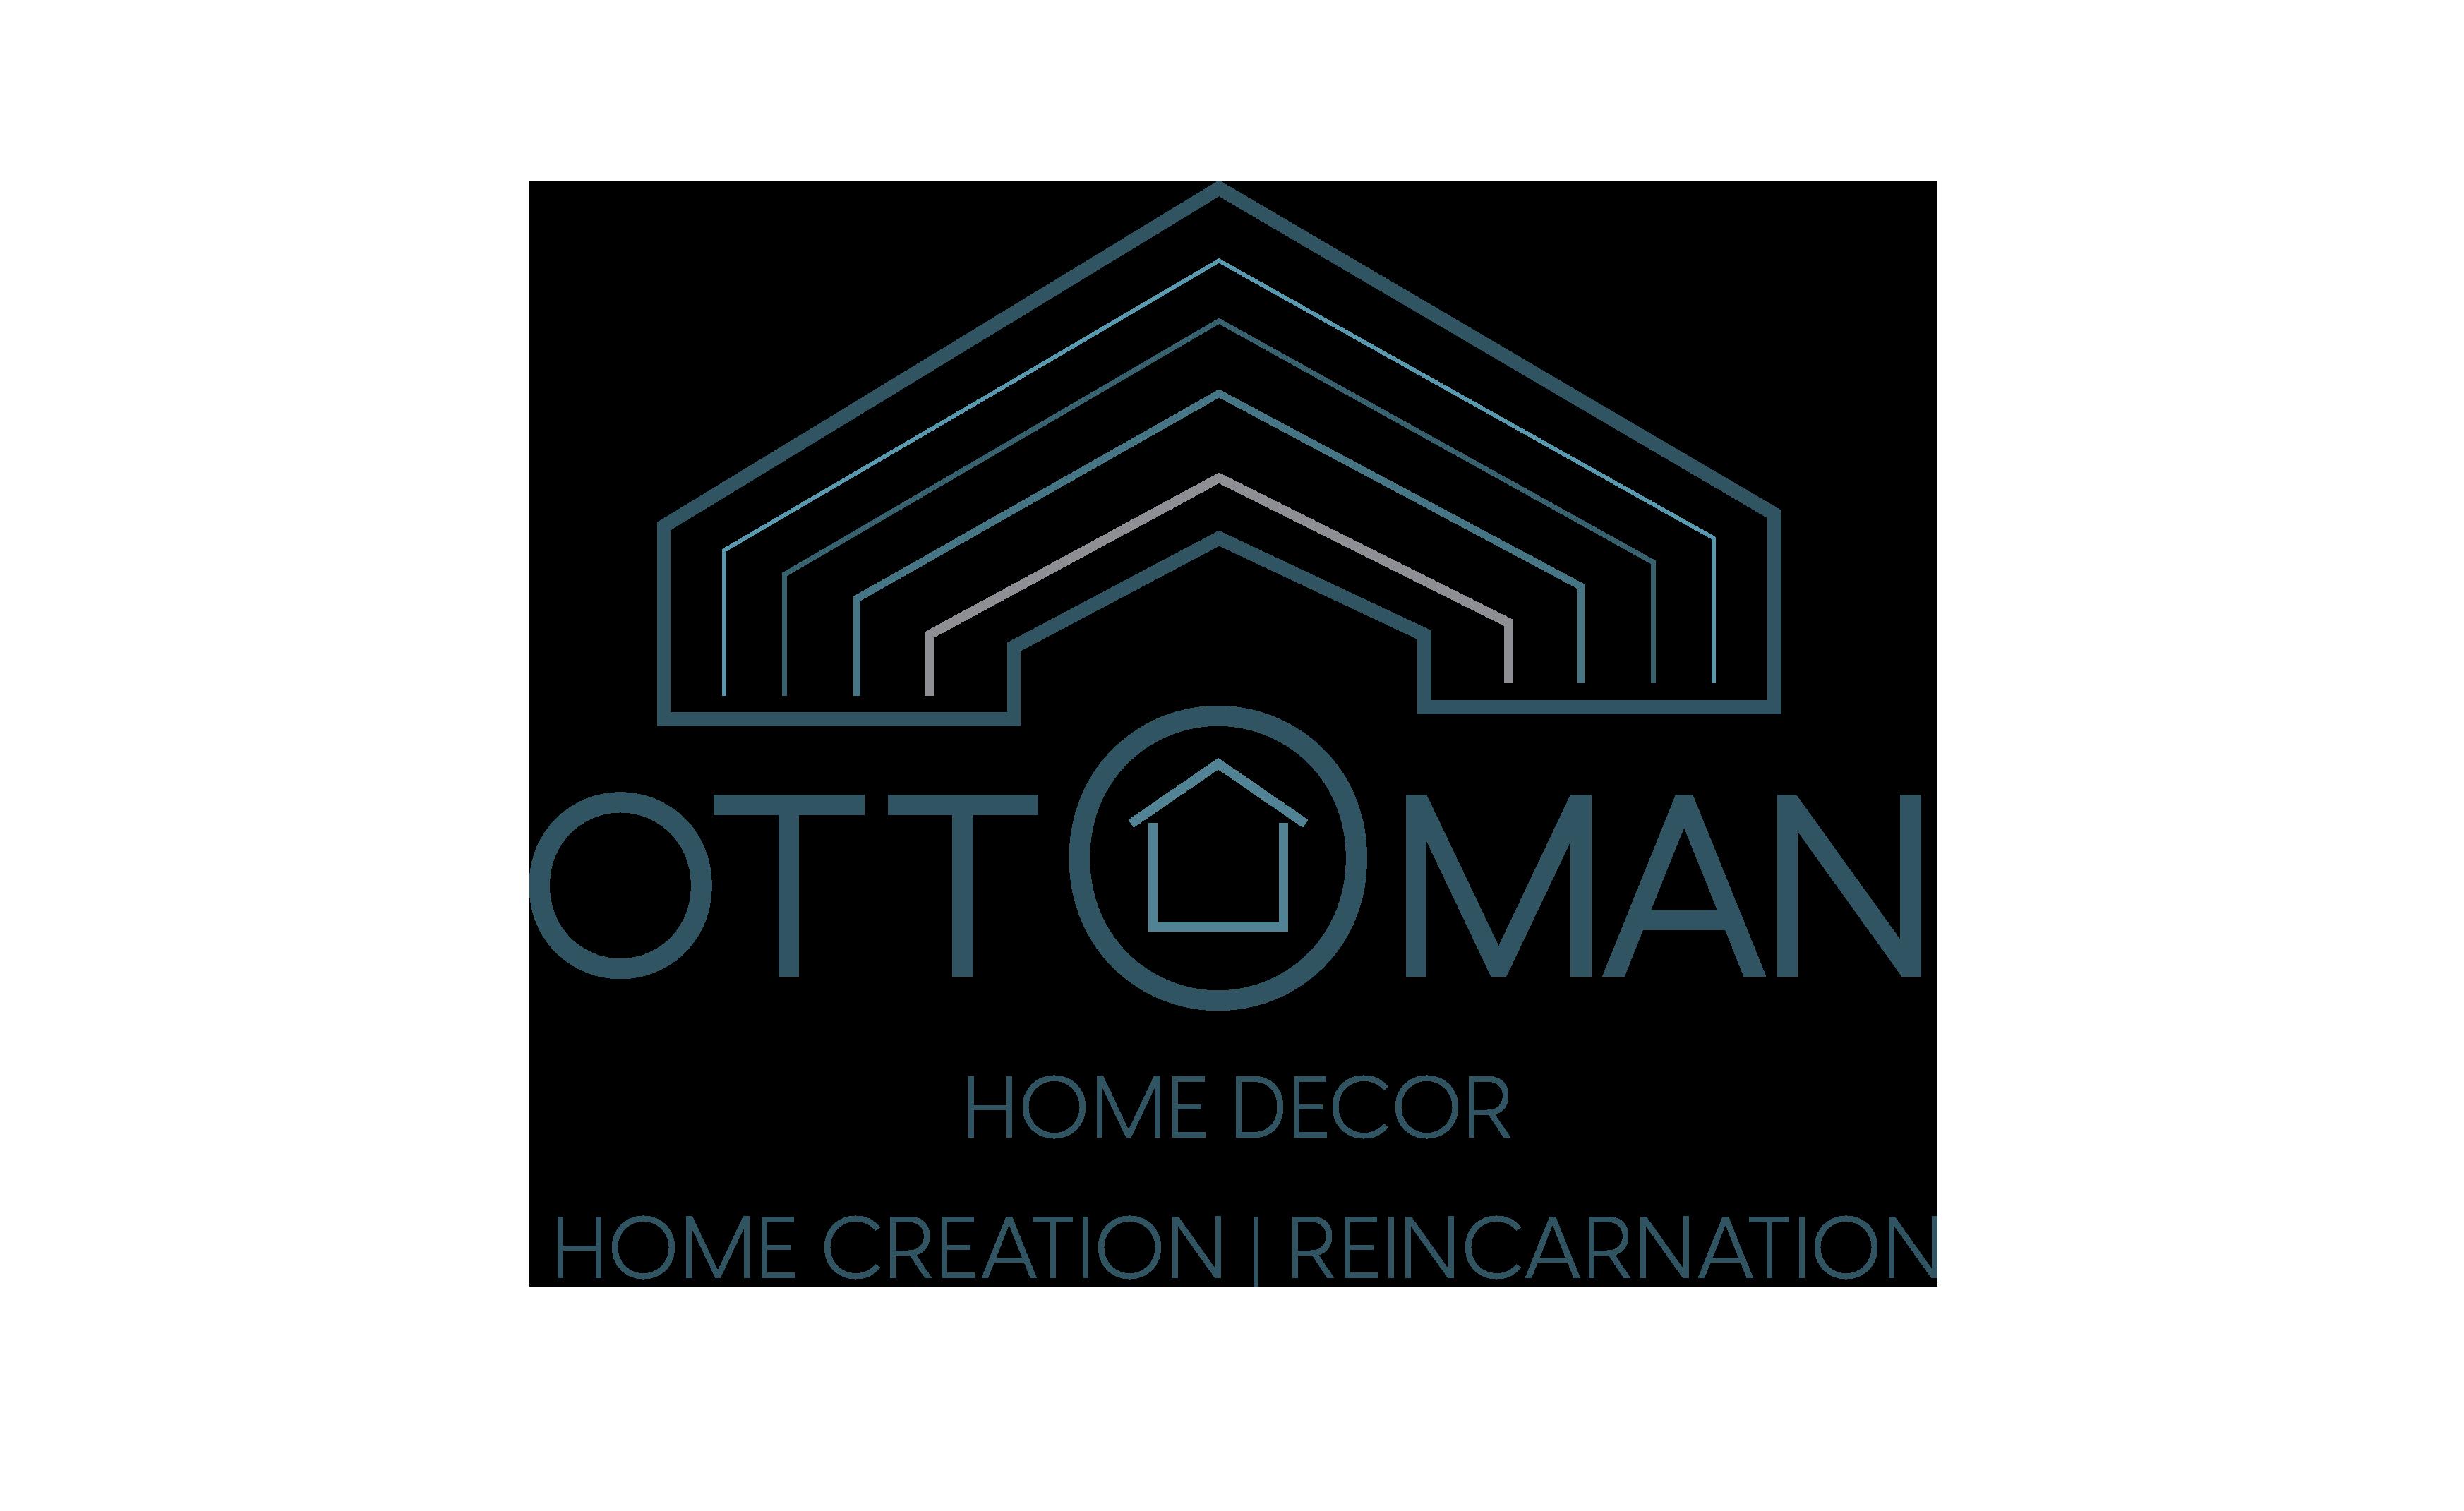 Ottoman Home Décor